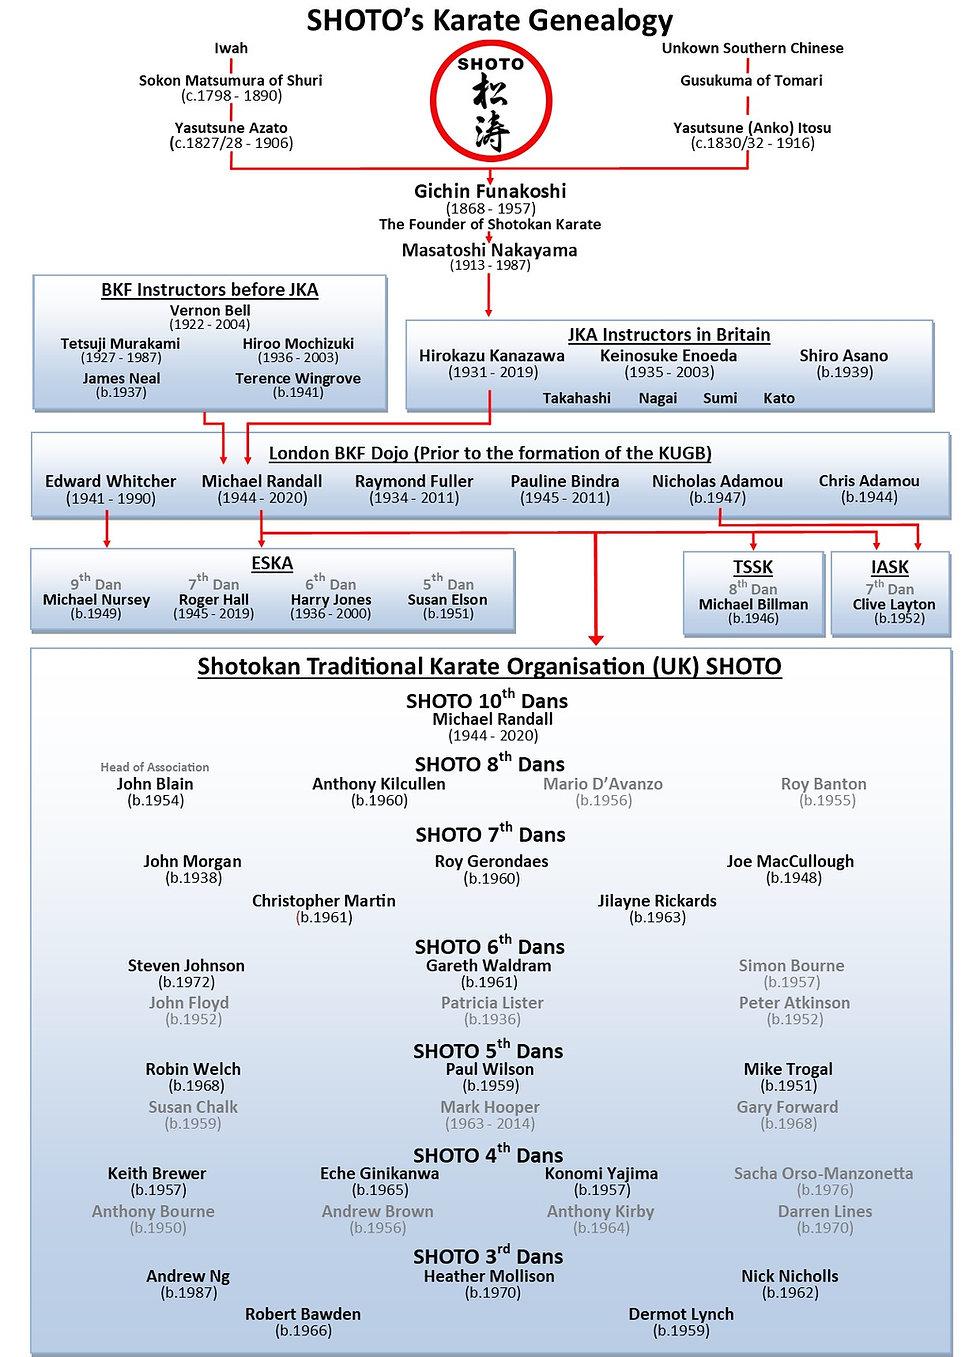 Shoto Geneology Jan 2021.jpg